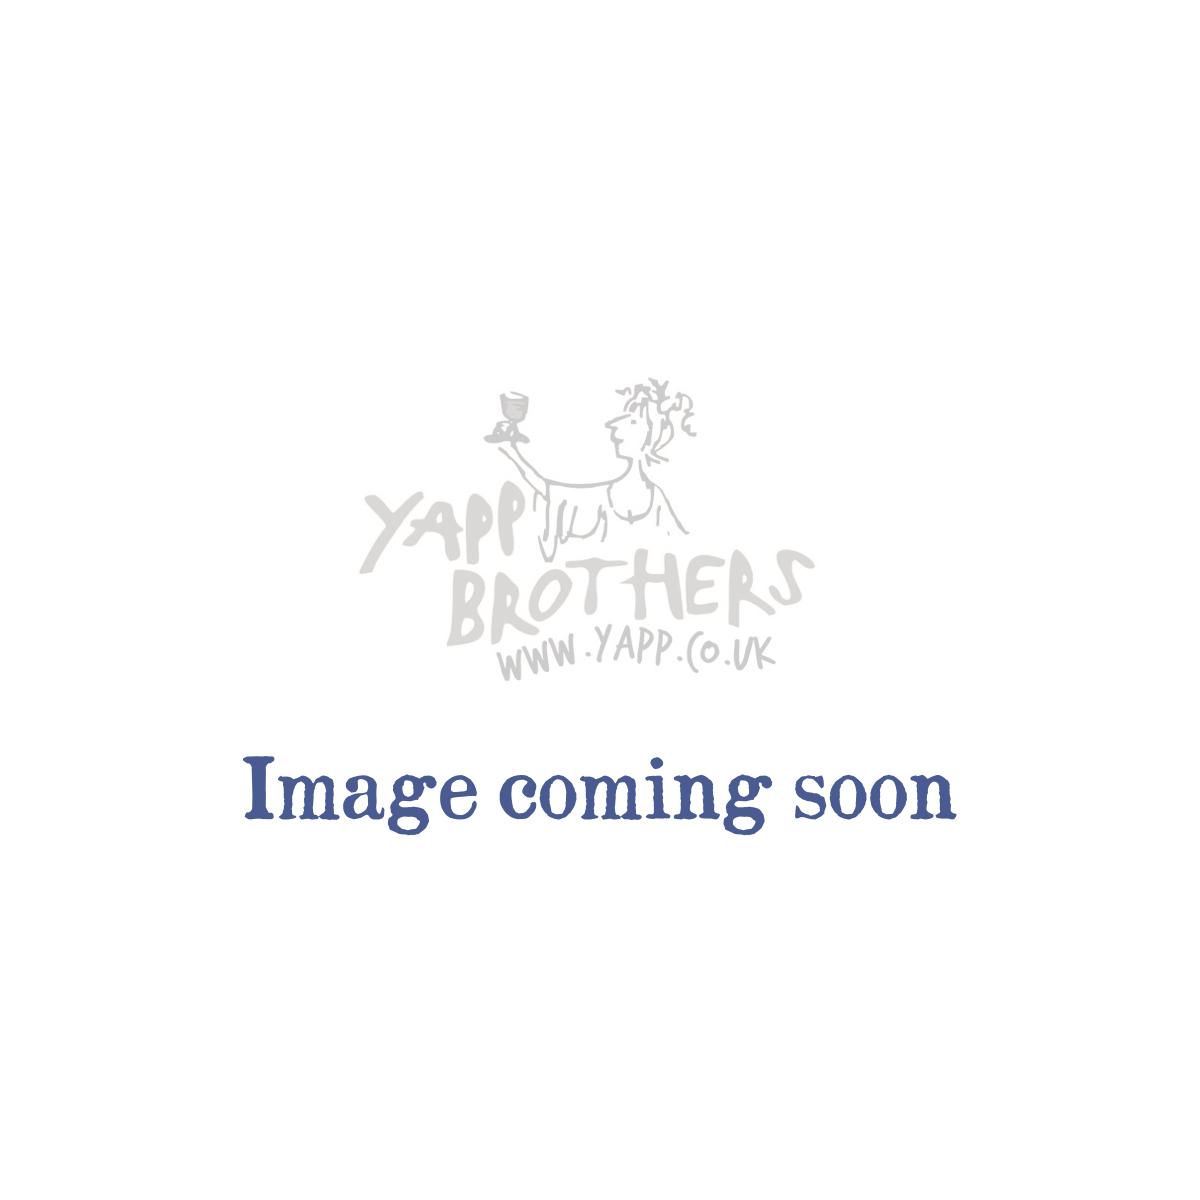 Domaine Gardrat: Vin de Pays Charentais Sauvignon 2020 - Bottle